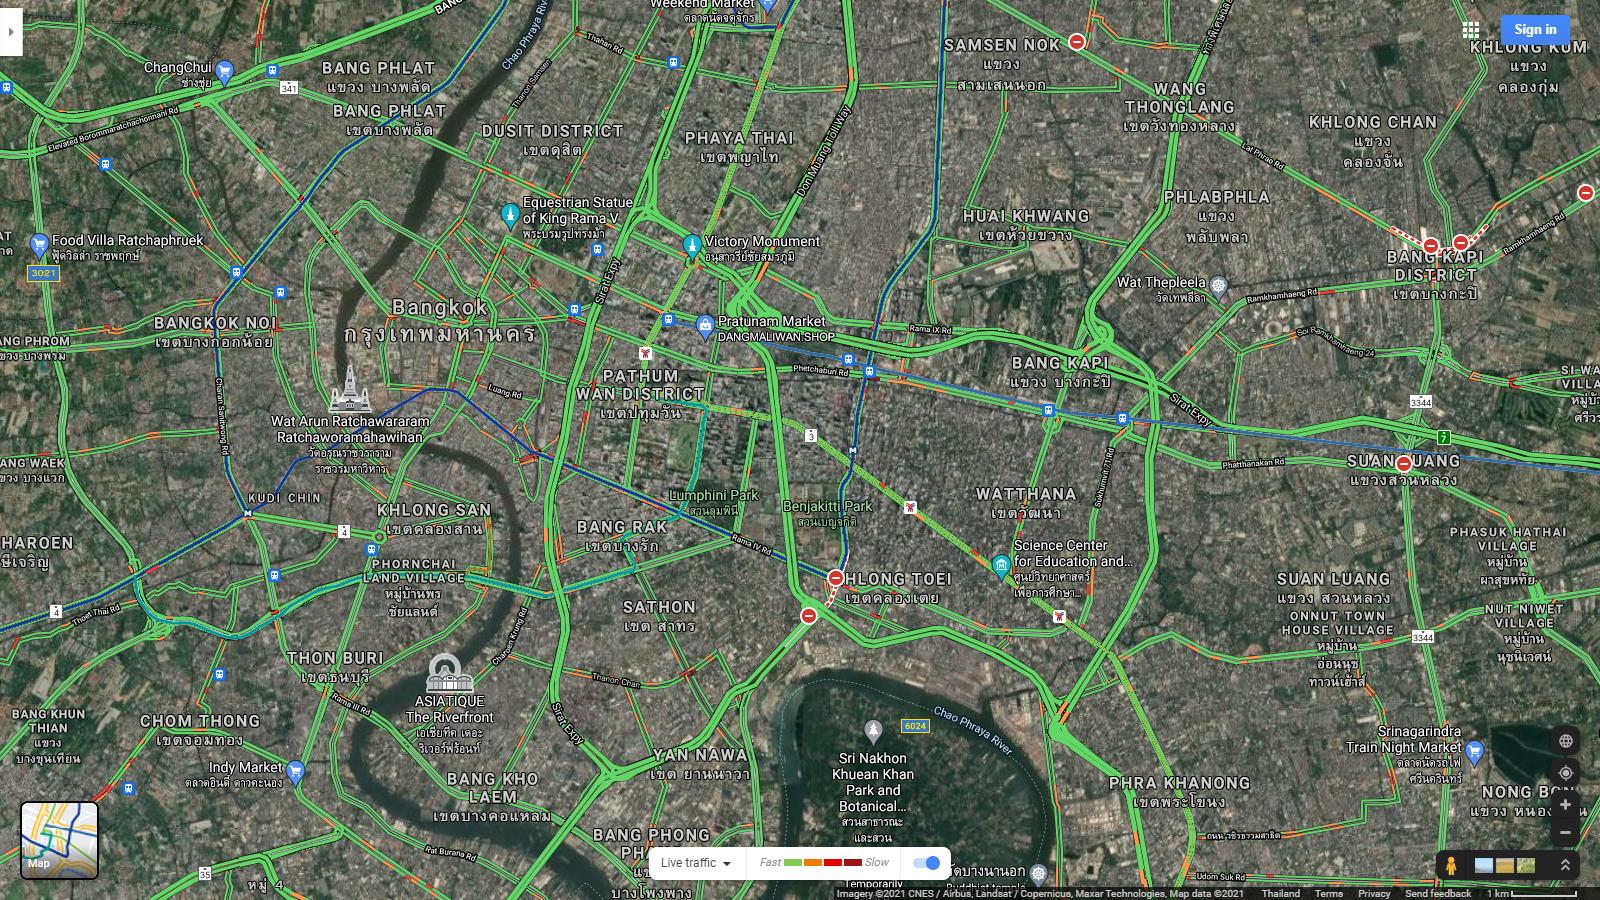 www.thaiguide.dk/images/forum/covid19/trafik%2002-05-21%20kl%2018.png